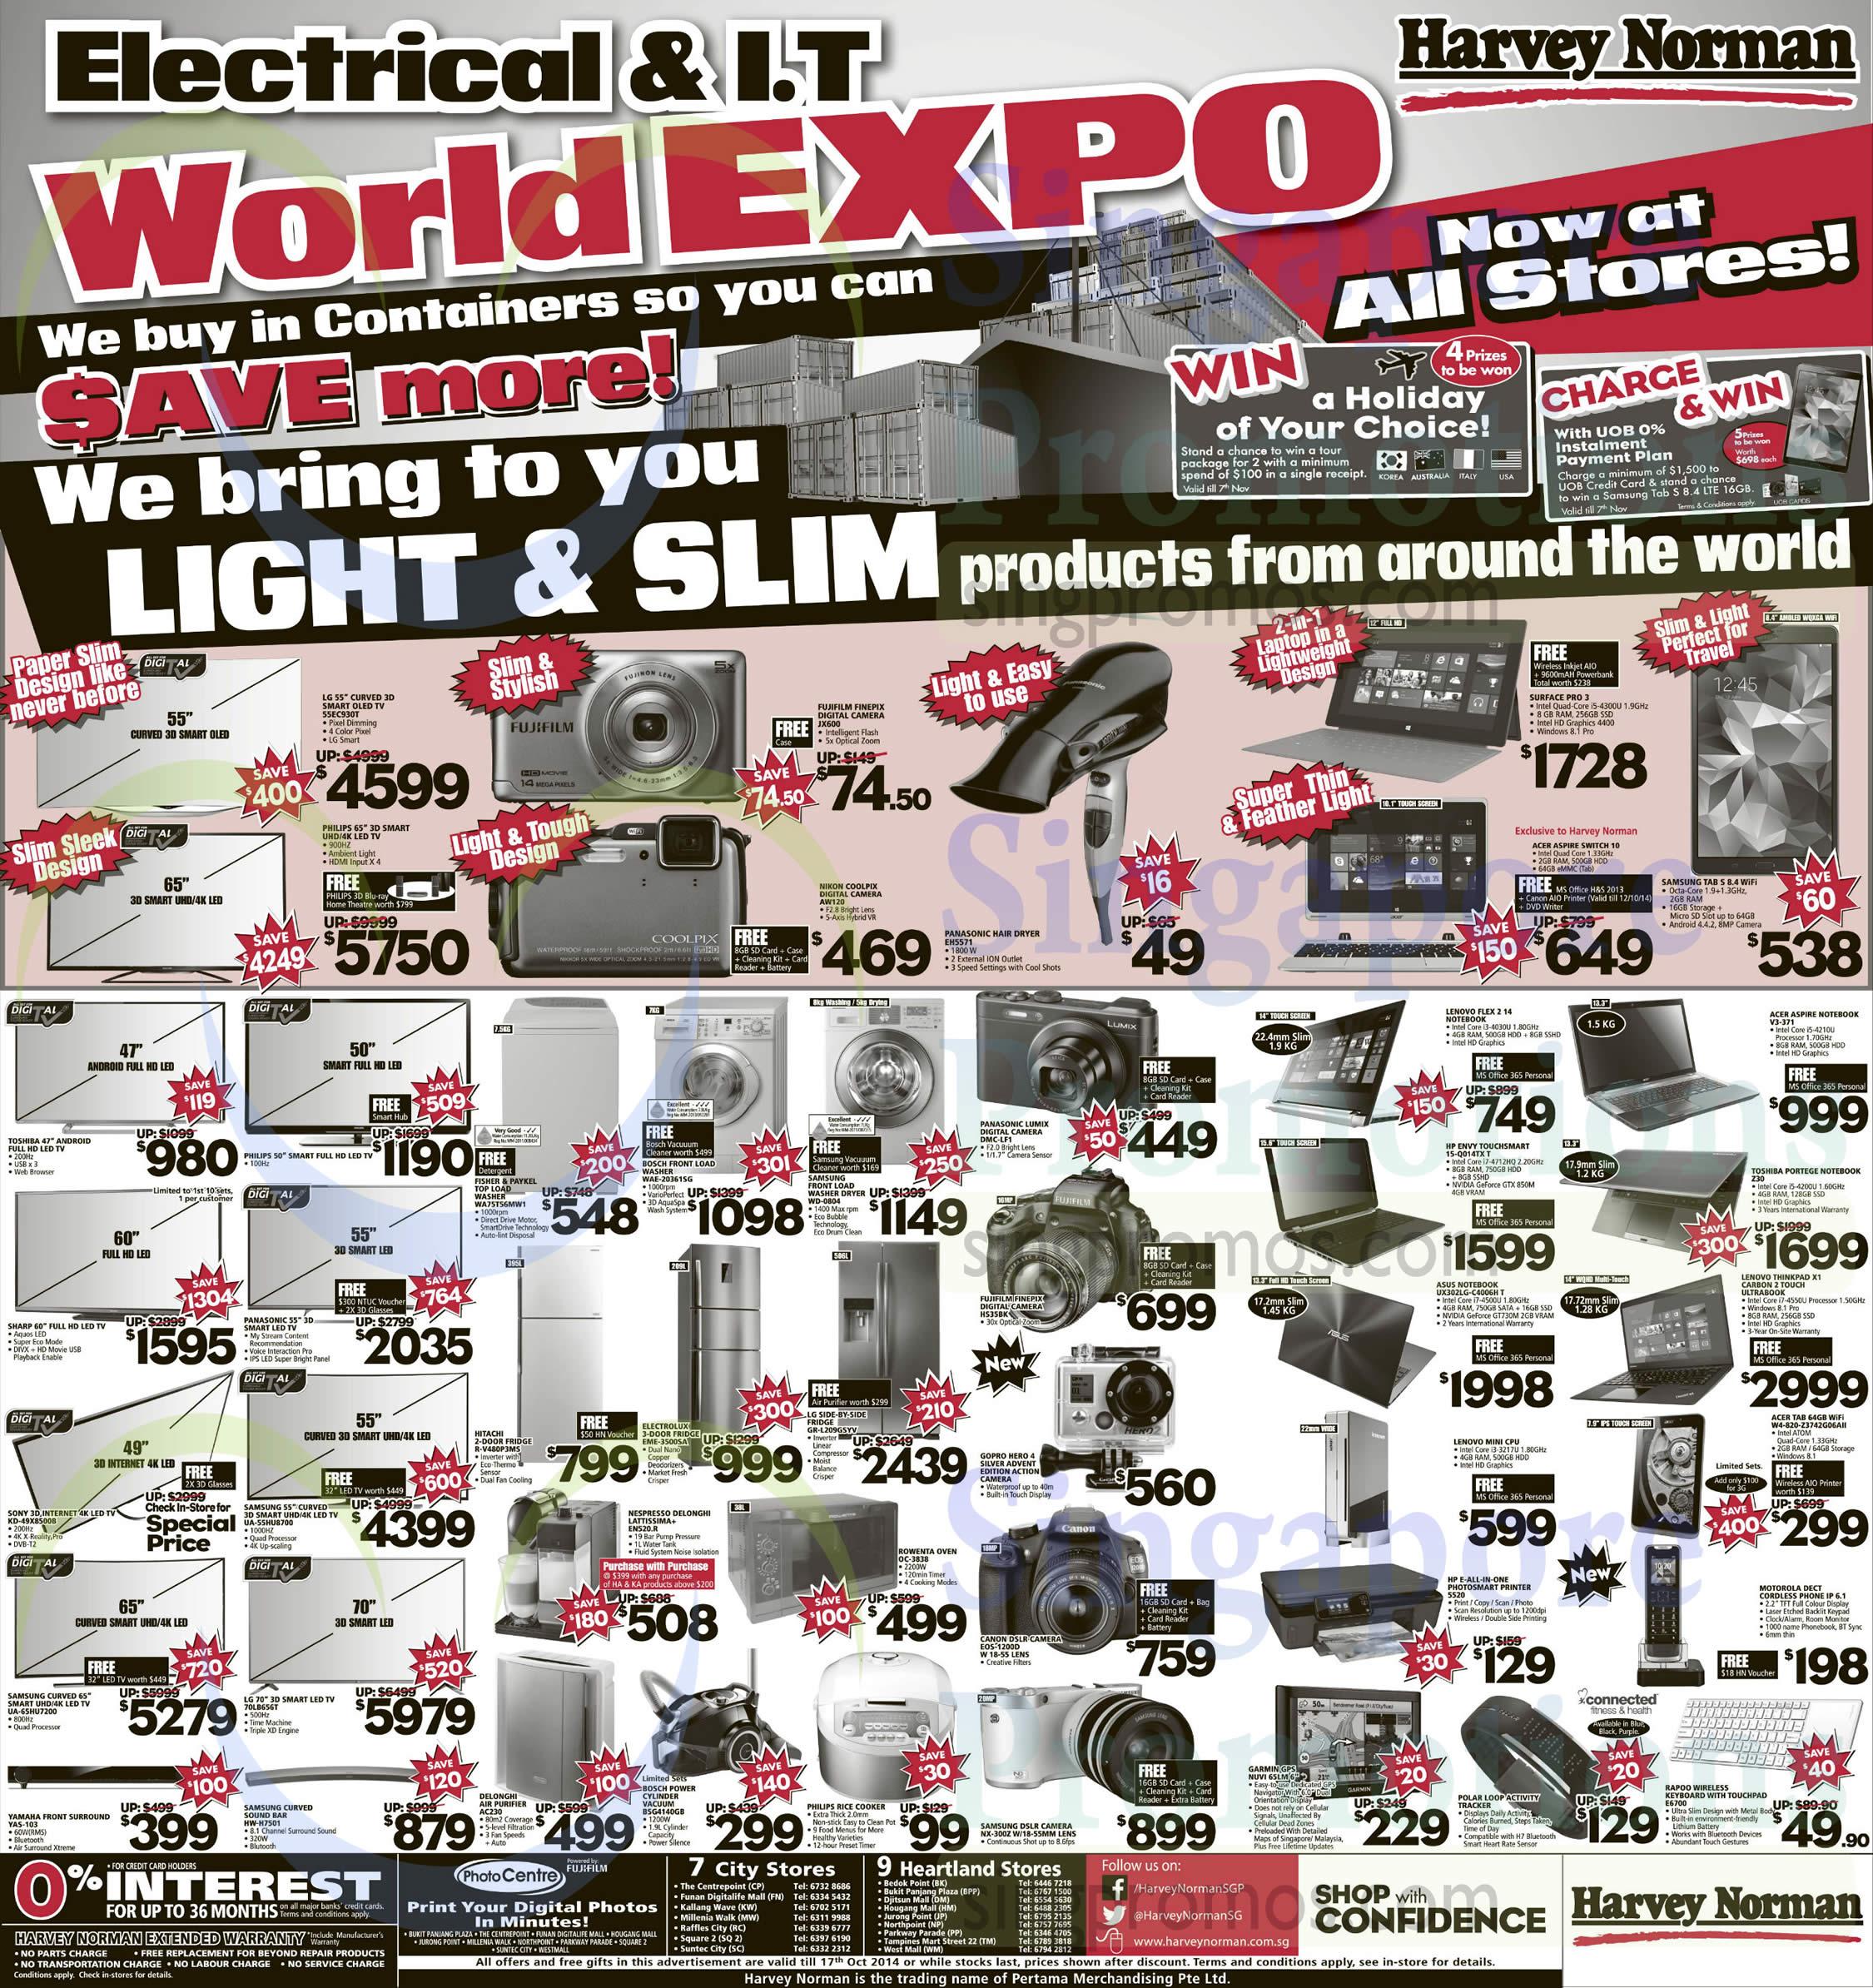 LG 55EC930T TV, Fujifilm JX600 Digital Camera, Nikon AW120 Digital Camera, Microsoft Surface Pro 3, Acer Aspire Switch 10 Notebook, Samsung Galaxy Tab S 8.4, Sony KD-49X8500B TV, Samsung UA-55HU8700 TV, Samsung UA-65HU7200 TV, LG 70LB656T TV, Yamaha YAS-103 Speakers, Samsung HW-H7501 Sound Bar, Fisher & Paykel WA75T56MW1 Washer, Bosch WAE-20361SG Washer, Samsung WD-0804 Washer, Hitachi R-V480P3MS Fridge, Electrolux EME-3500SA Fridge, LG GR-L209GSYV Fridge, Nespresso Delonghi Latissima+ Coffee Machine, Rowenta OC-3838 Oven, Delonghi AC230 Air Purifier, Bosch BSG4140GB Vacuum Cleaner, Panasonic DMC-LF1 Digital Camera, Fujifilm HS35BK Digital Camera, Gopro Hero 4 Video Camera, Canon EOS-1200D DSLR Digital Camera, Samsung NX-300Z DSLR Digital Camera, Acer V3-371 Notebook, HP 15-Q014TX T Notebook, Toshiba Z30 Notebook, ASUS UX302LG-C4006H Notebook, Acer W4-820-Z3742G06AII Tablet and HP 5520 Printer